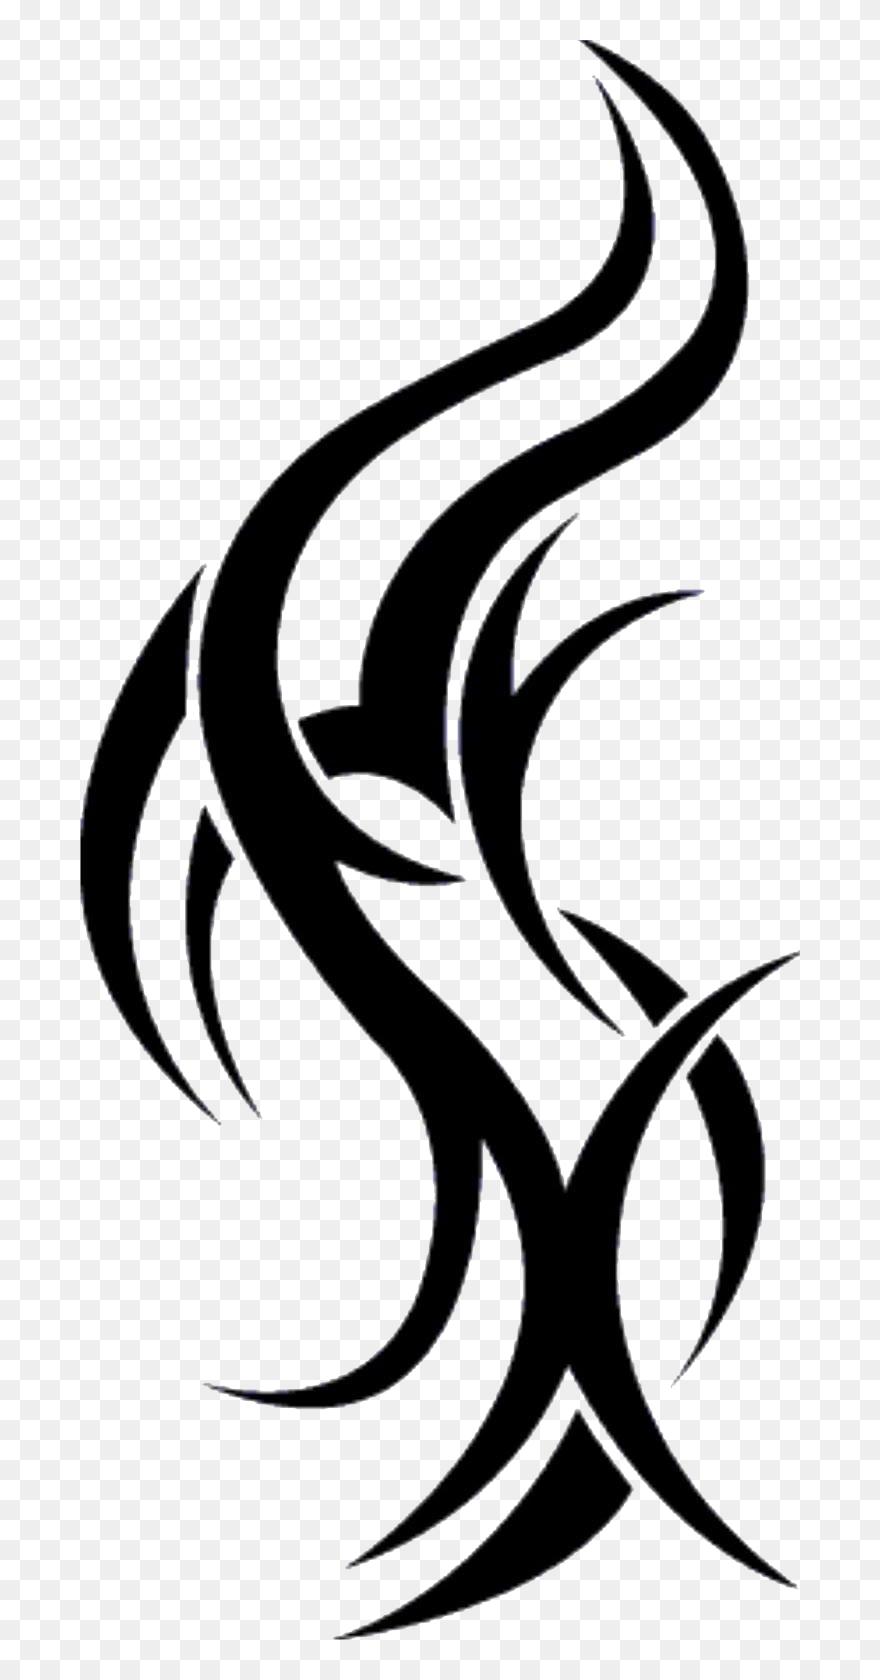 Tribal Tattoo Png : tribal, tattoo, Download, Tribal, Tattoos, Background, Photo, Family, Tattoo, Designs, Clipart, Fo…, Tattoos,, Designs,